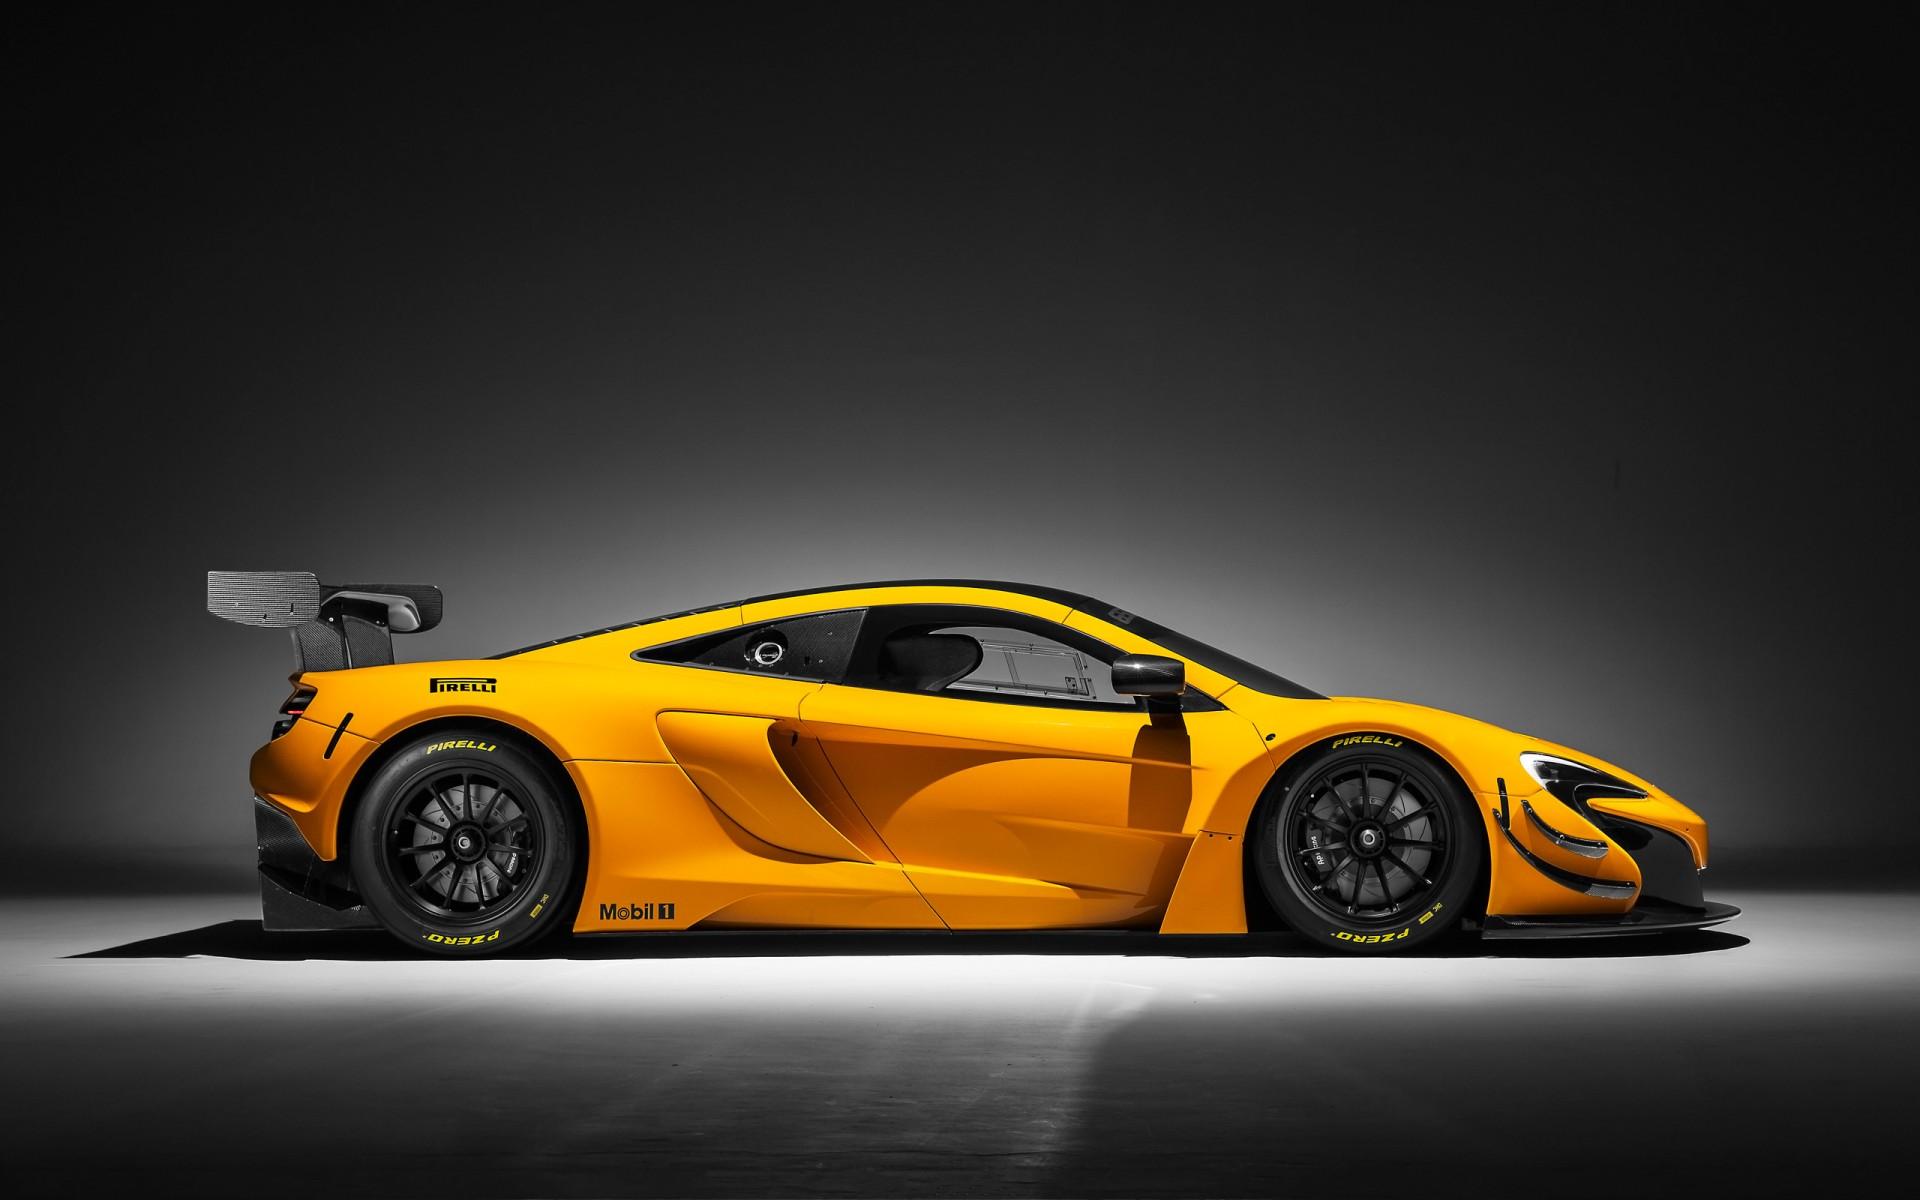 Cars Hd Wallpapers 1080p Lamborghini 2016 Mclaren 650s Gt3 3 Wallpaper Hd Car Wallpapers Id